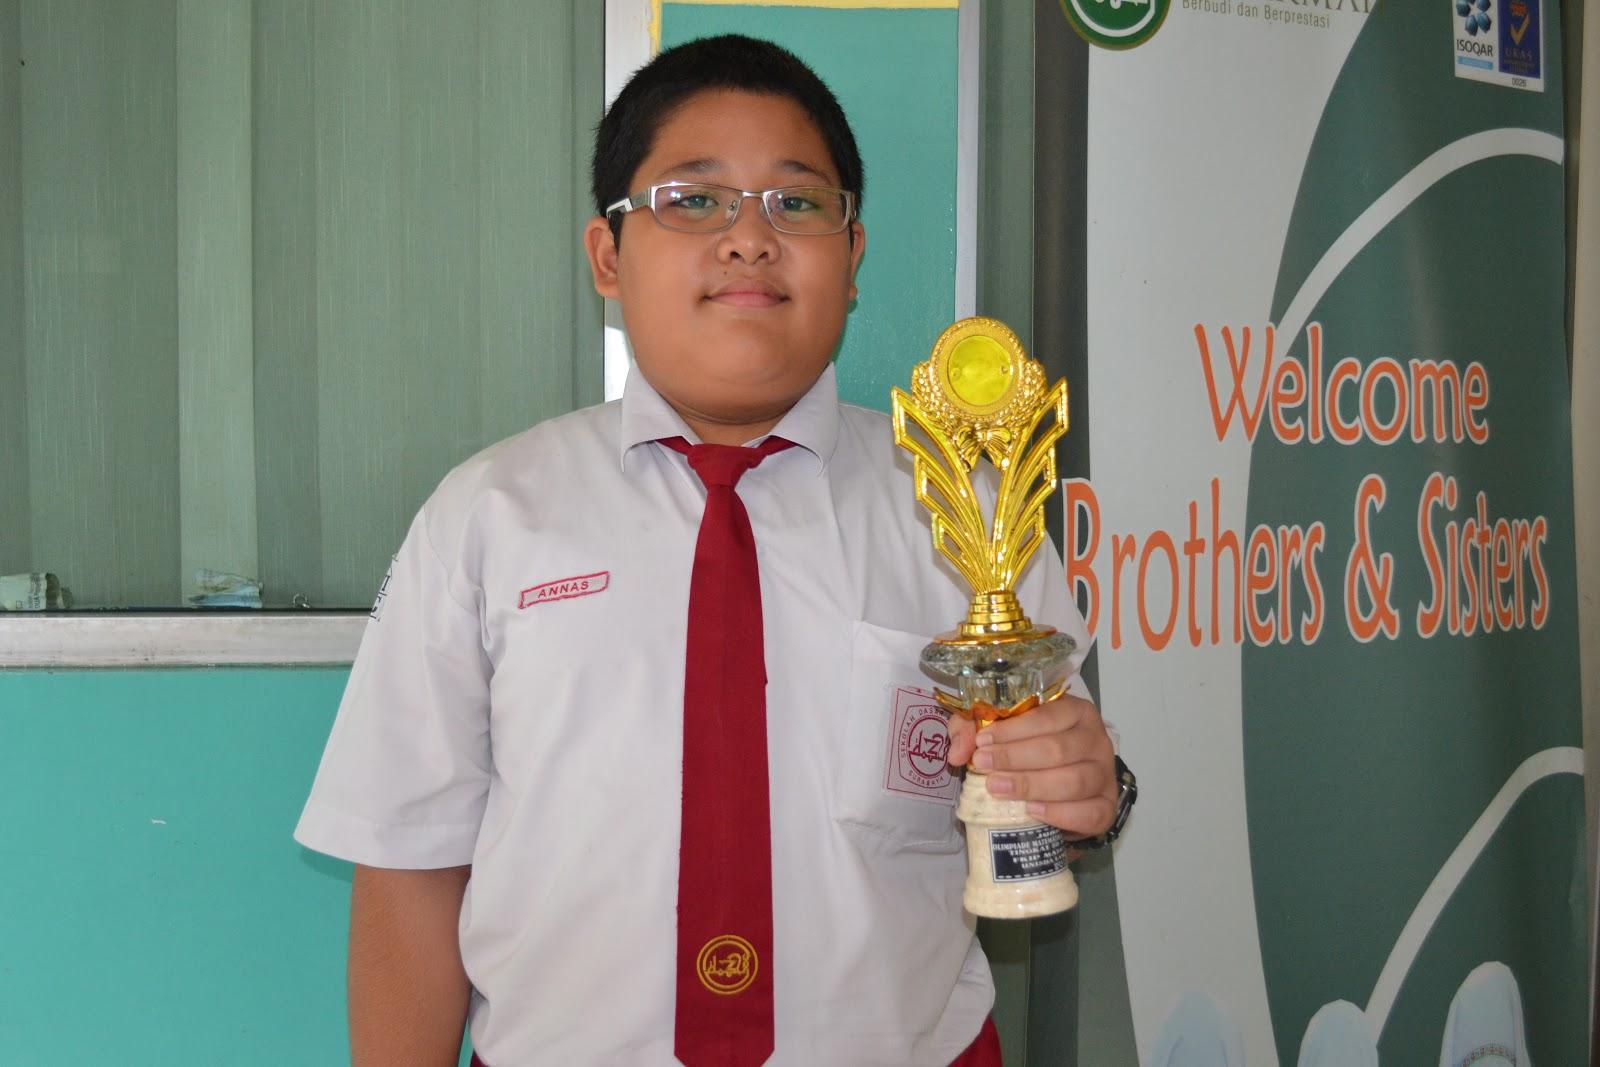 Lomba Matematika Sd 2013 Info Lomba 2015 Up To Date Sd Al Hikmah Surabaya Juara 3 Olimpiade Jawa Timur